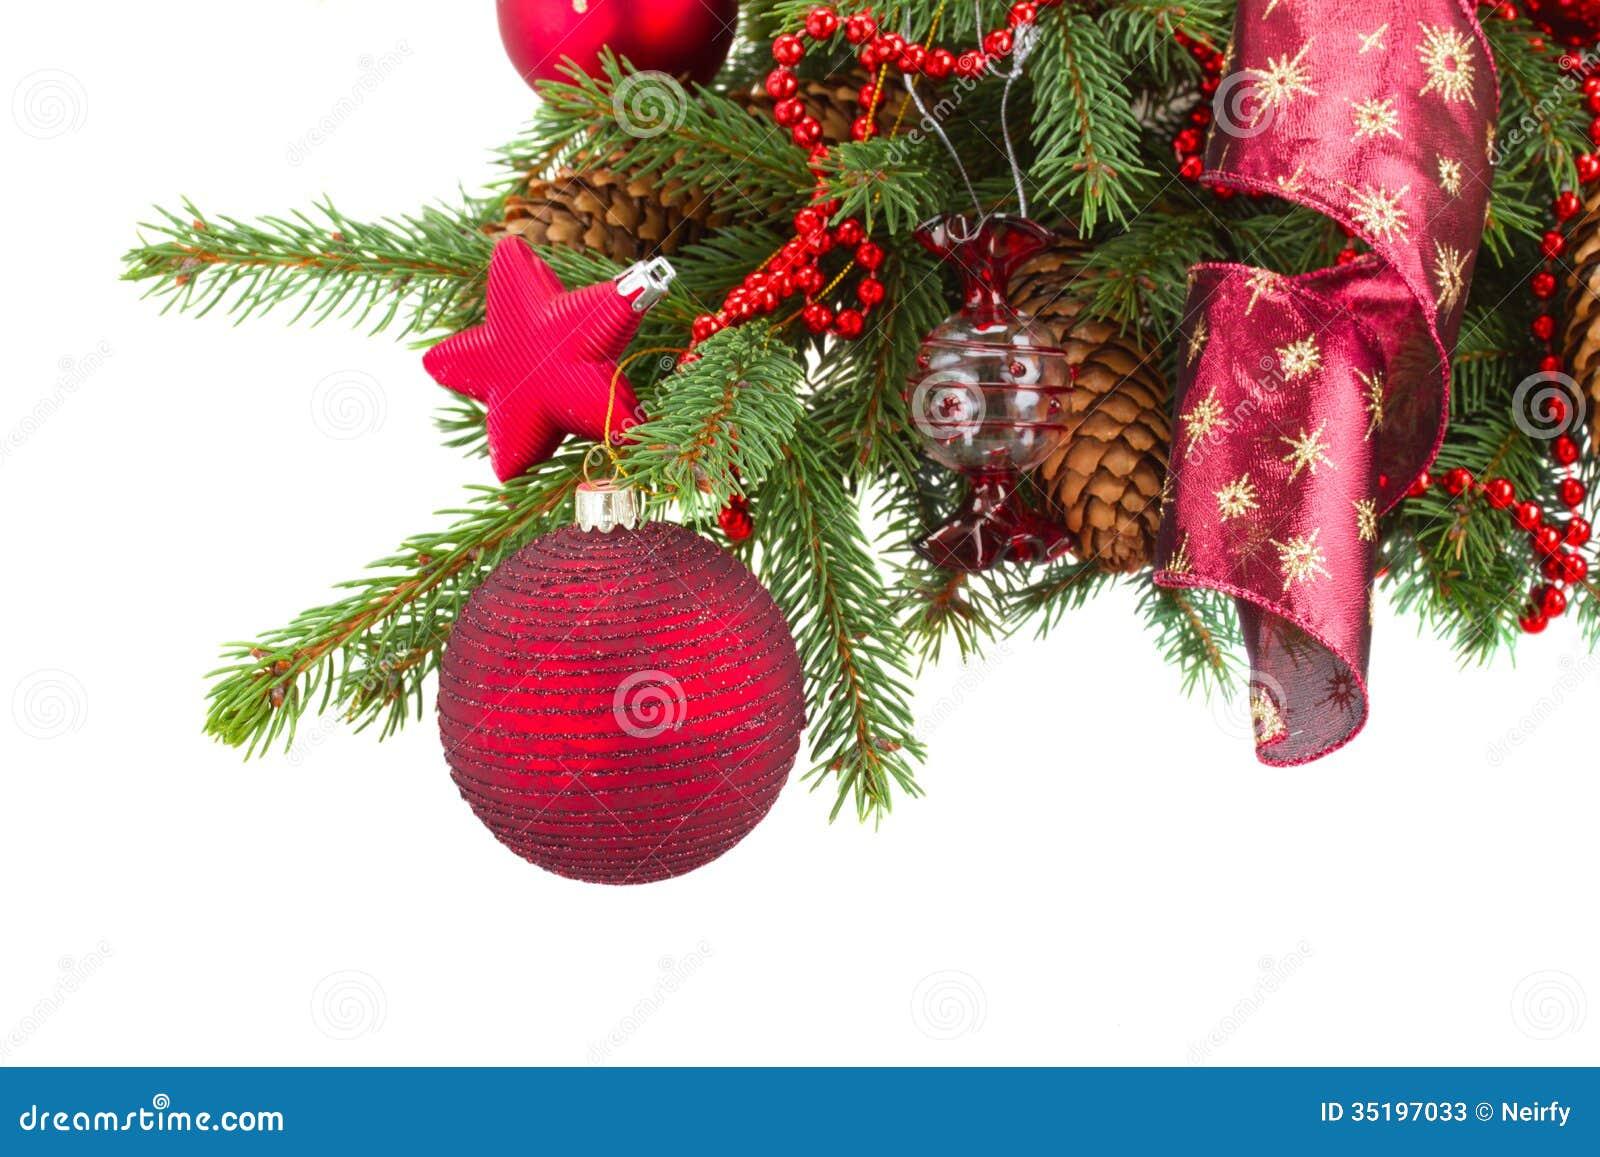 Green fir tree and red christmas ball stock image image for Red green christmas tree